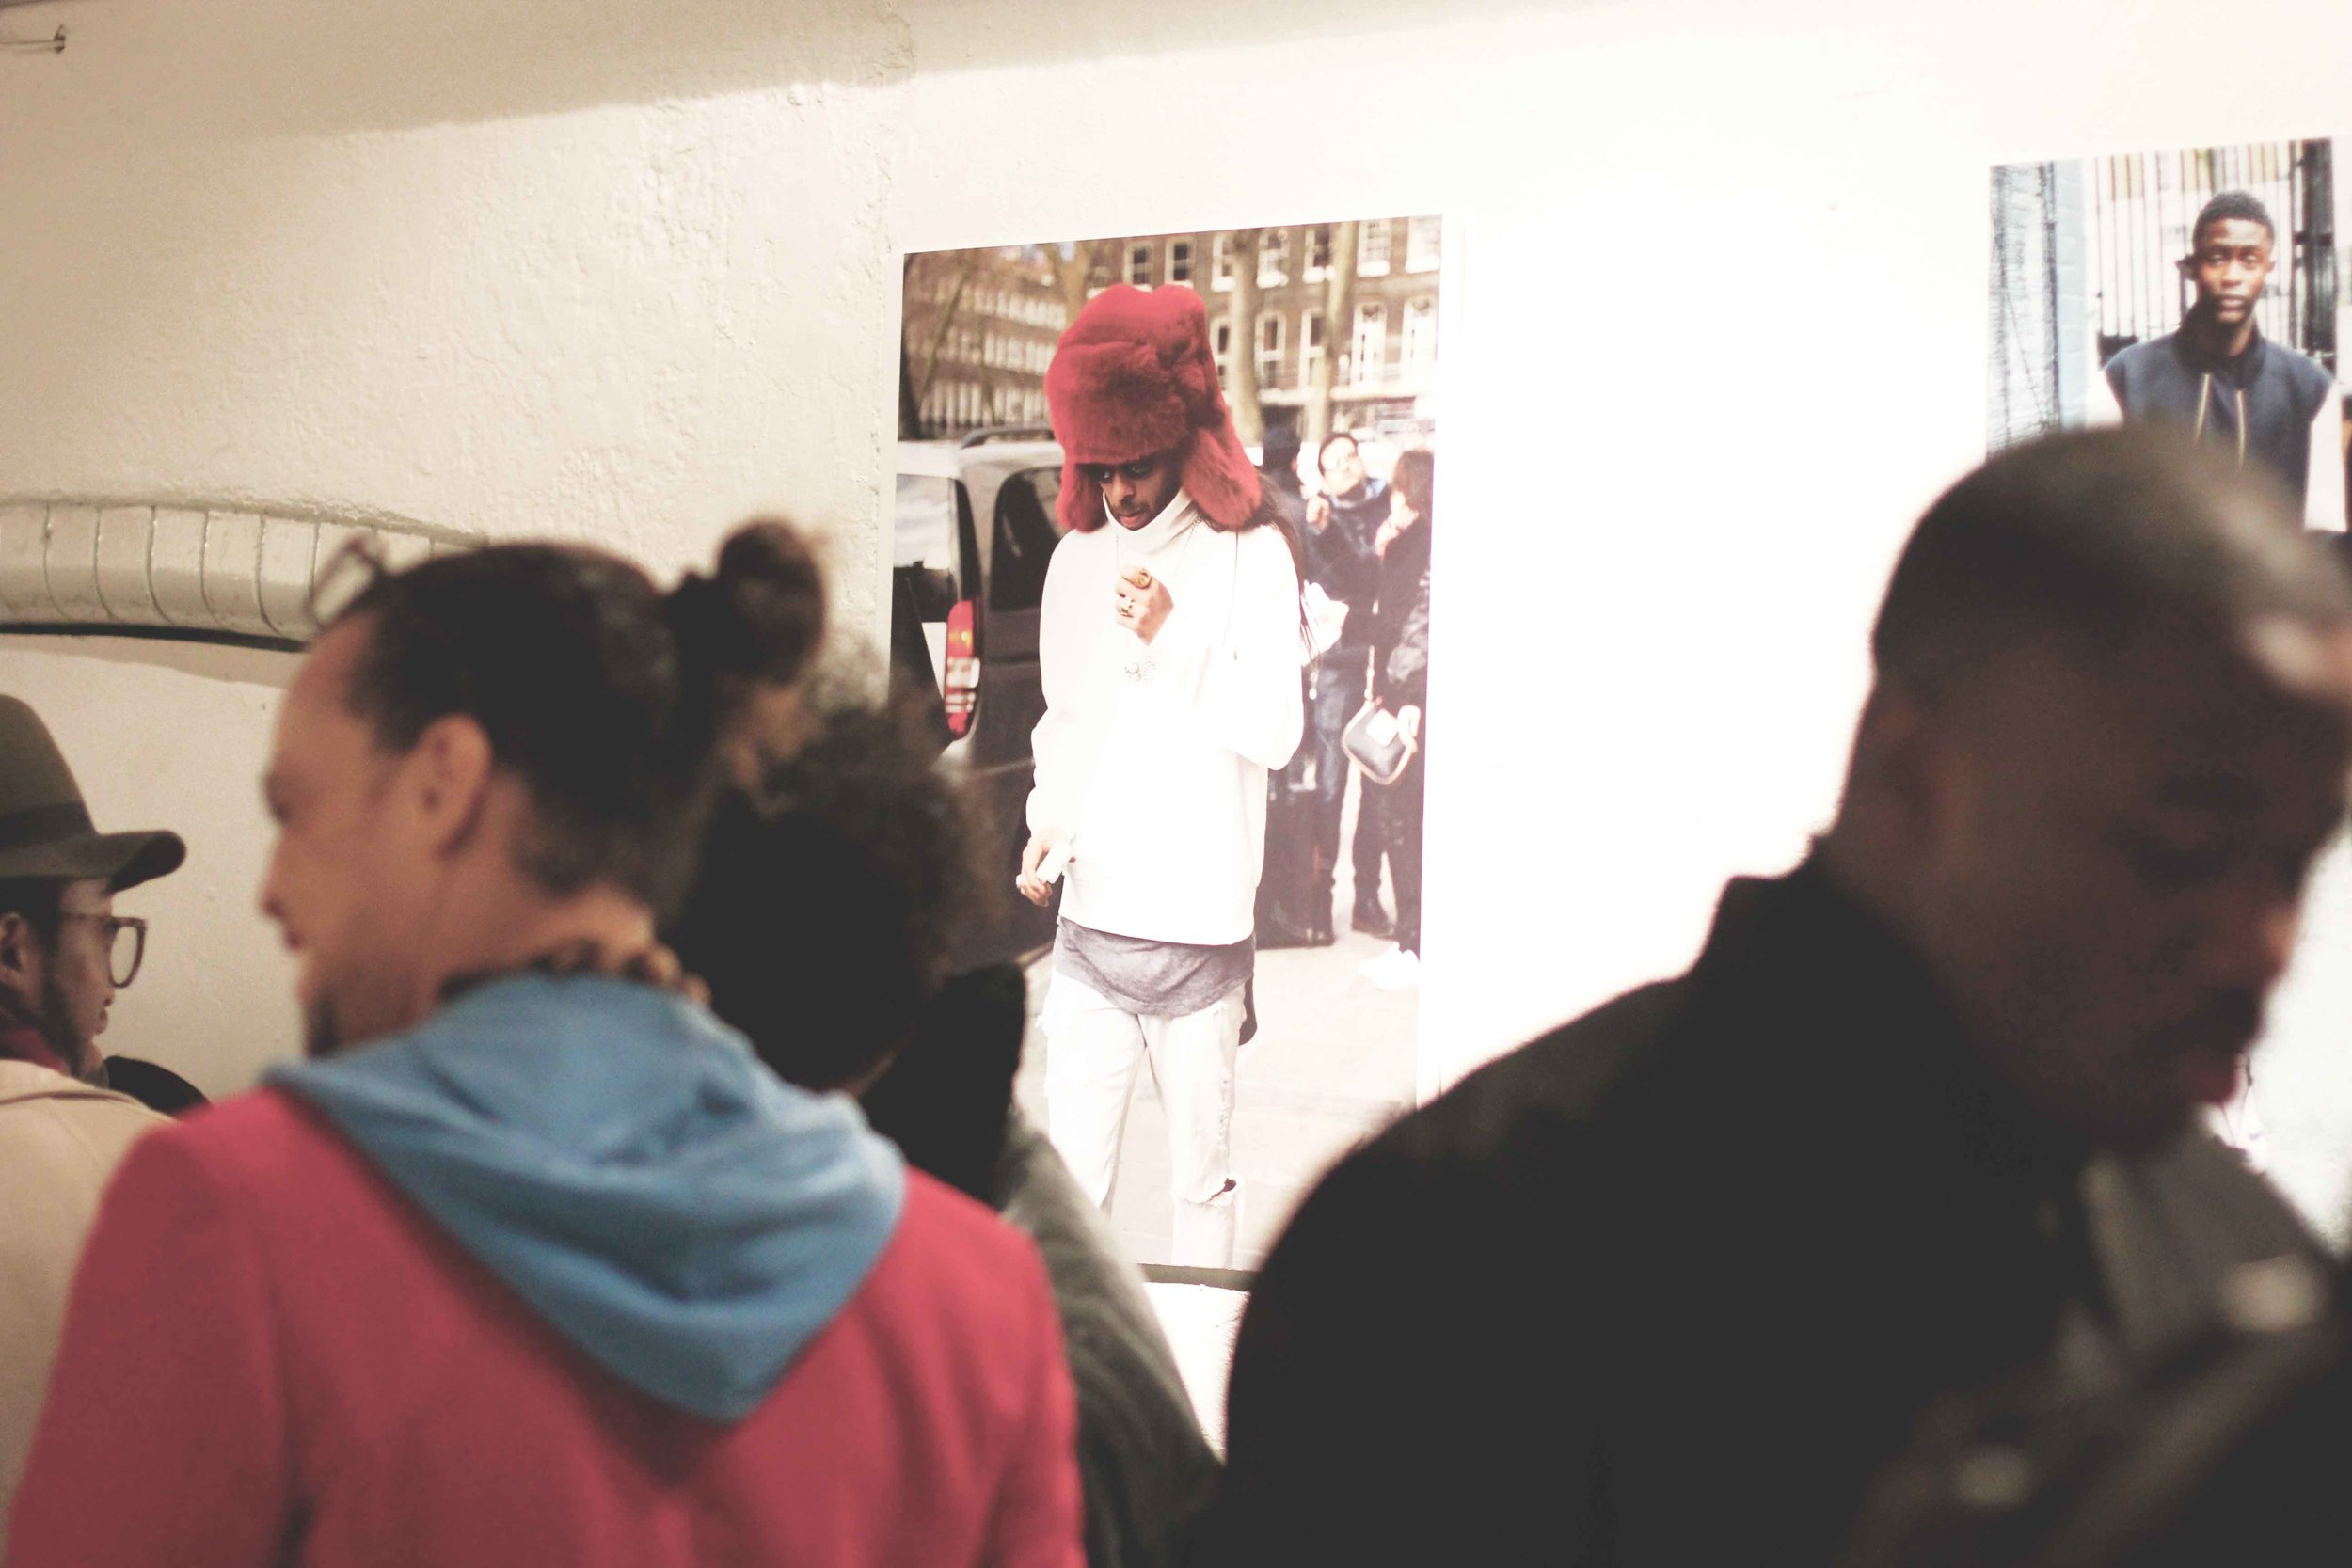 Jordan_Bunker_PAUSE_street_style_exhibition_16.jpg